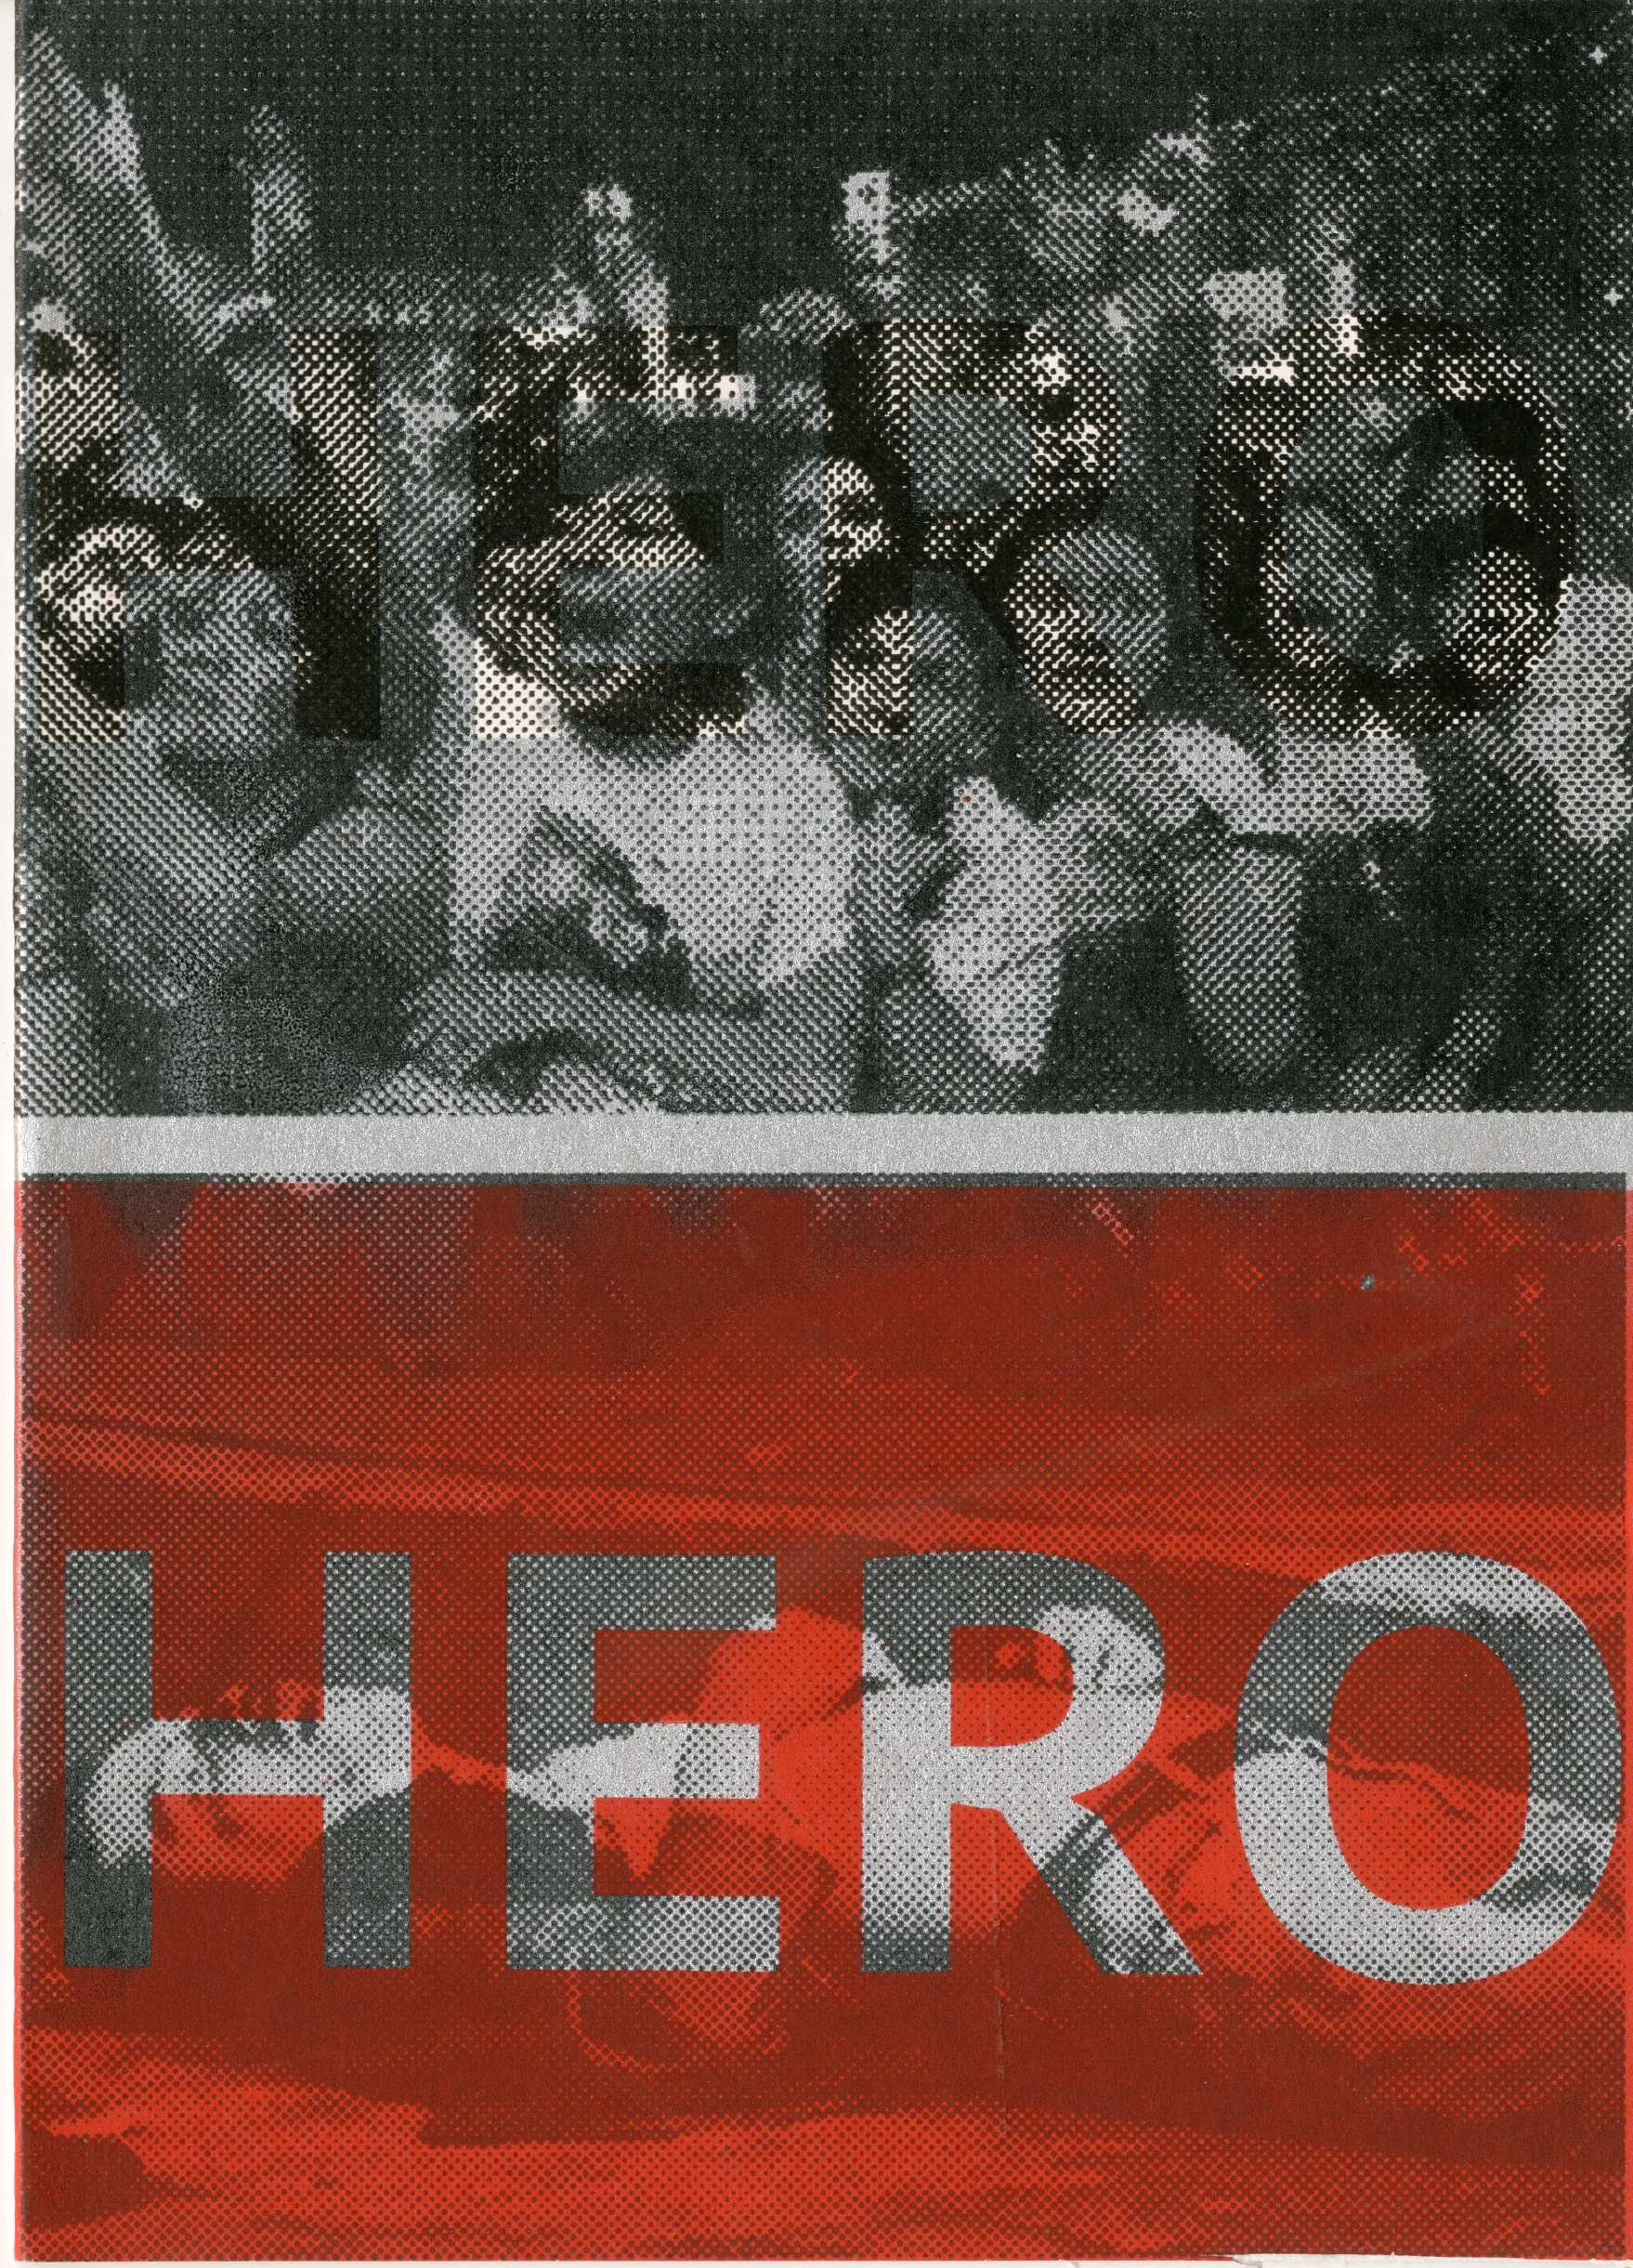 Hero No Hero